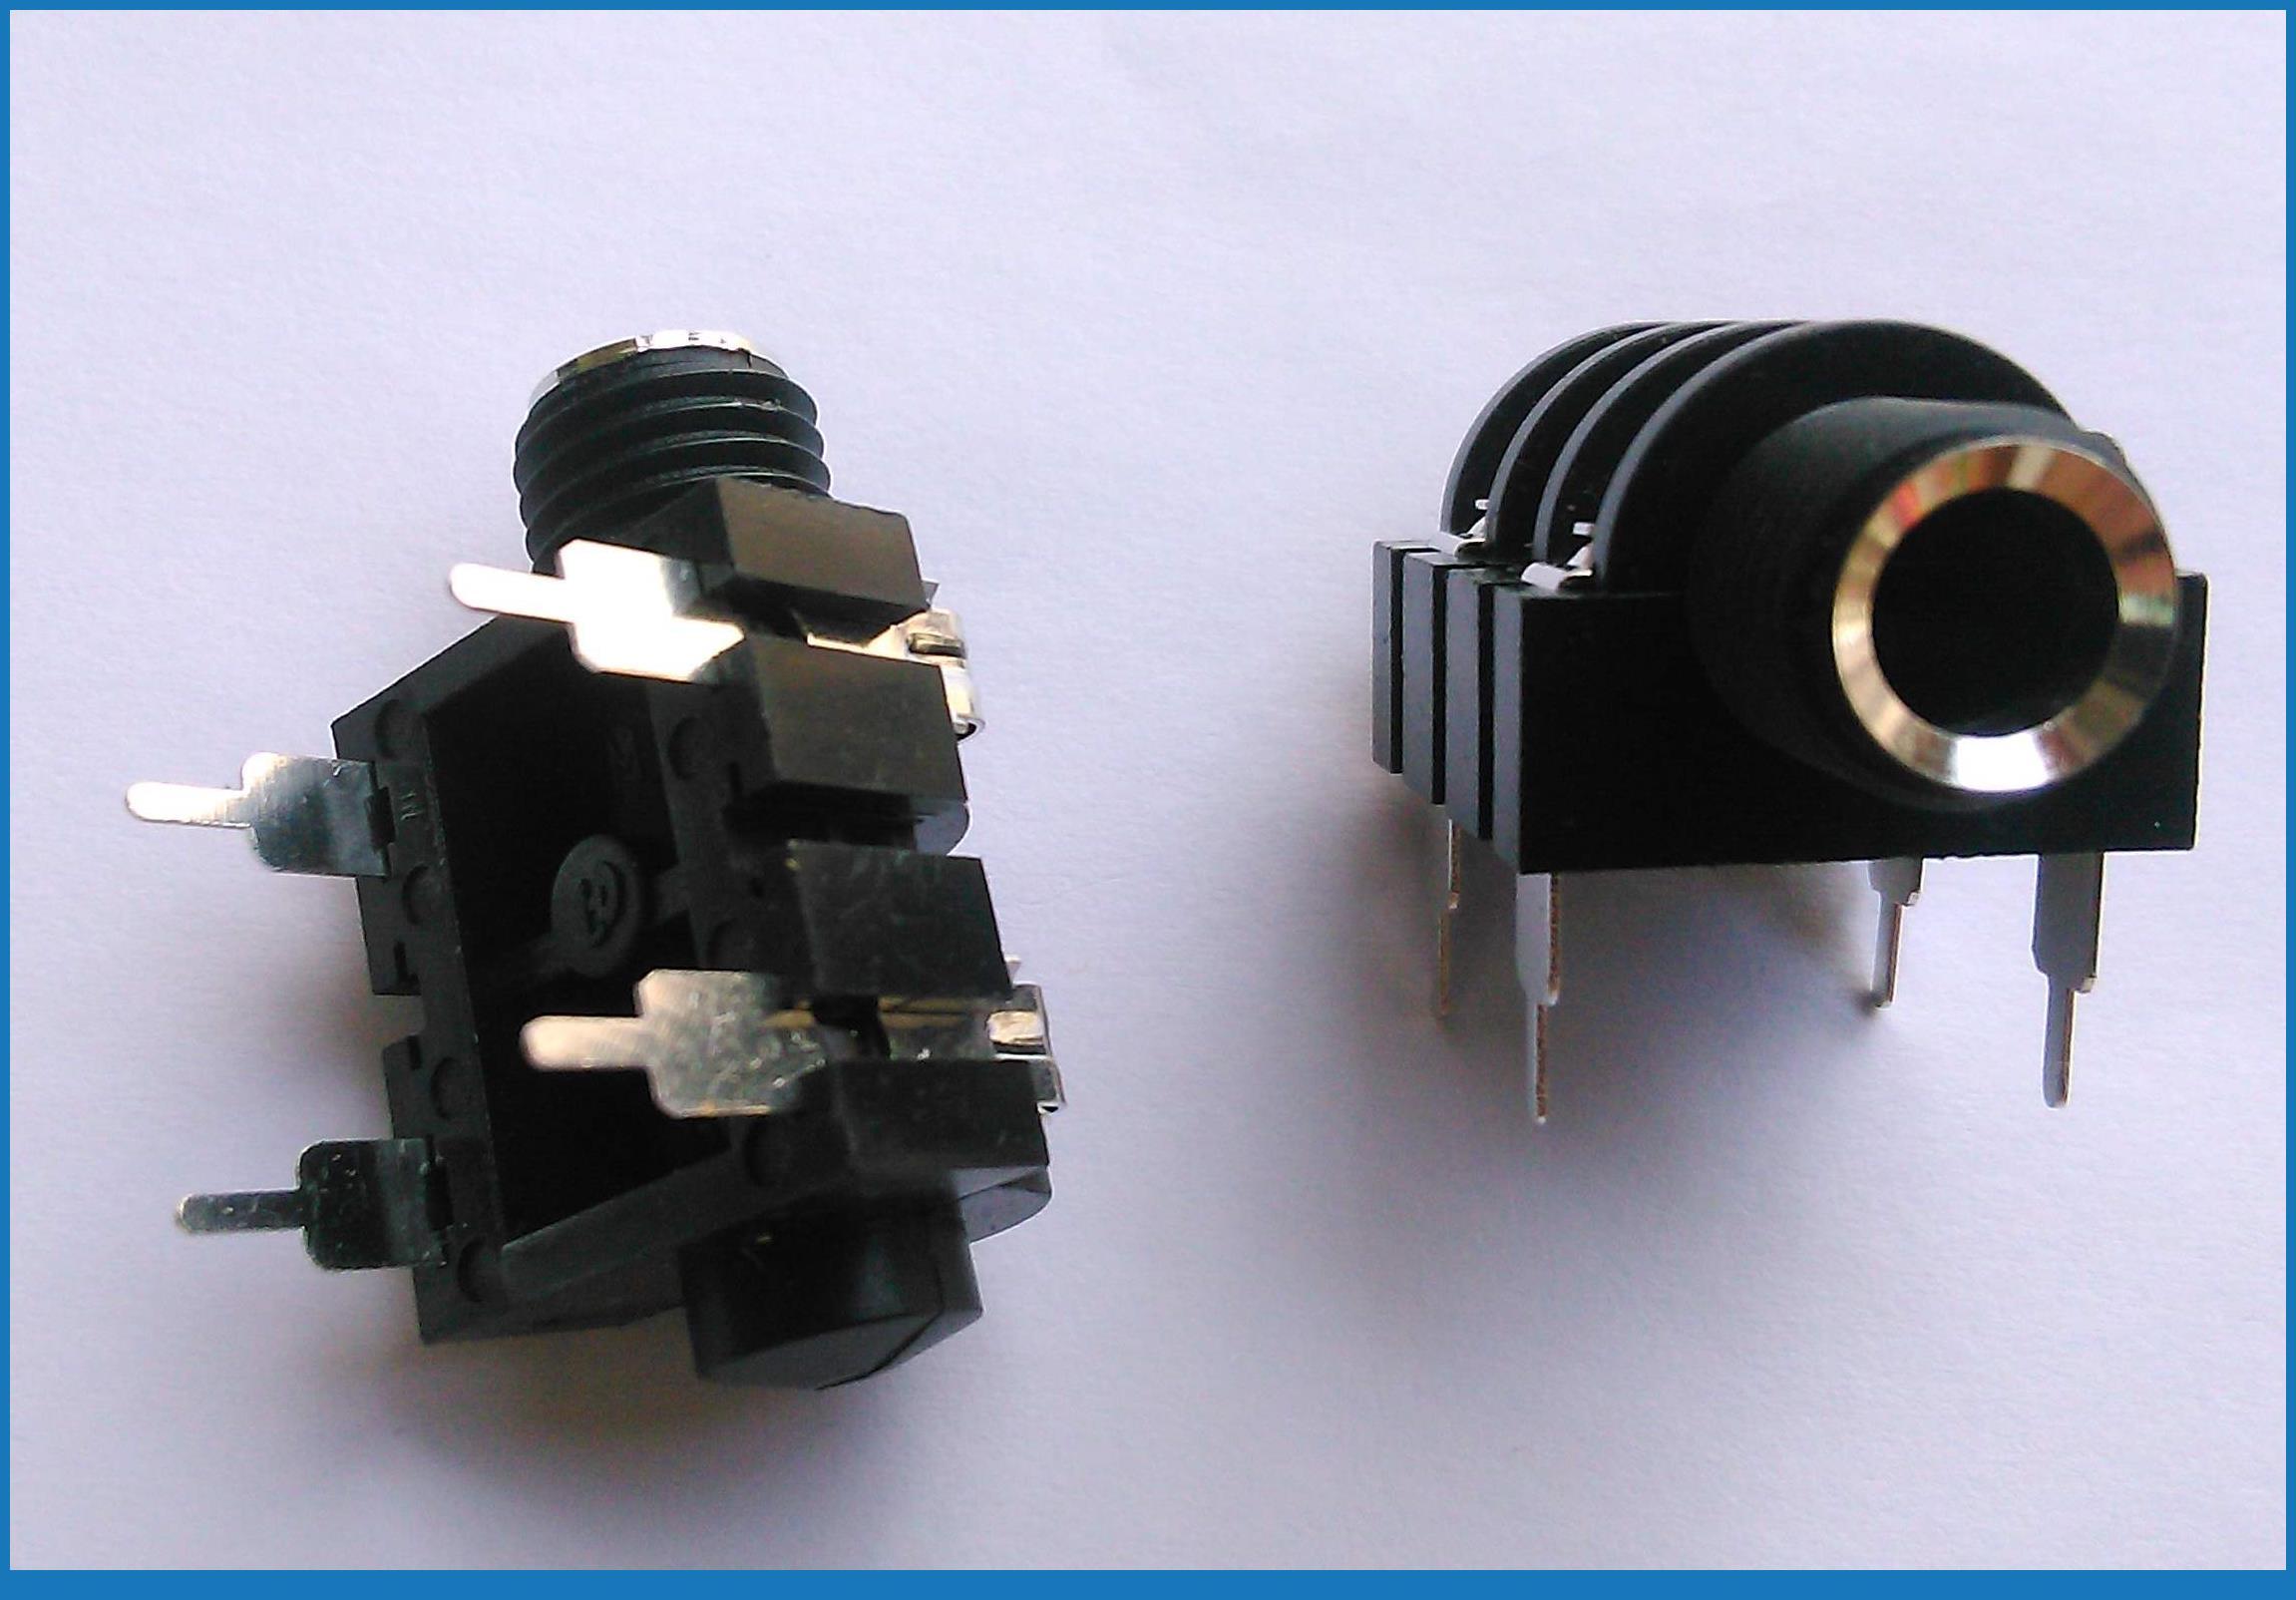 medium resolution of 10pcs 6 35mm mono headphone jack microphone 1 4 panel wiring socket amplifiers 1 4 6 35mm mono jack socket panel in connectors from lights lighting on